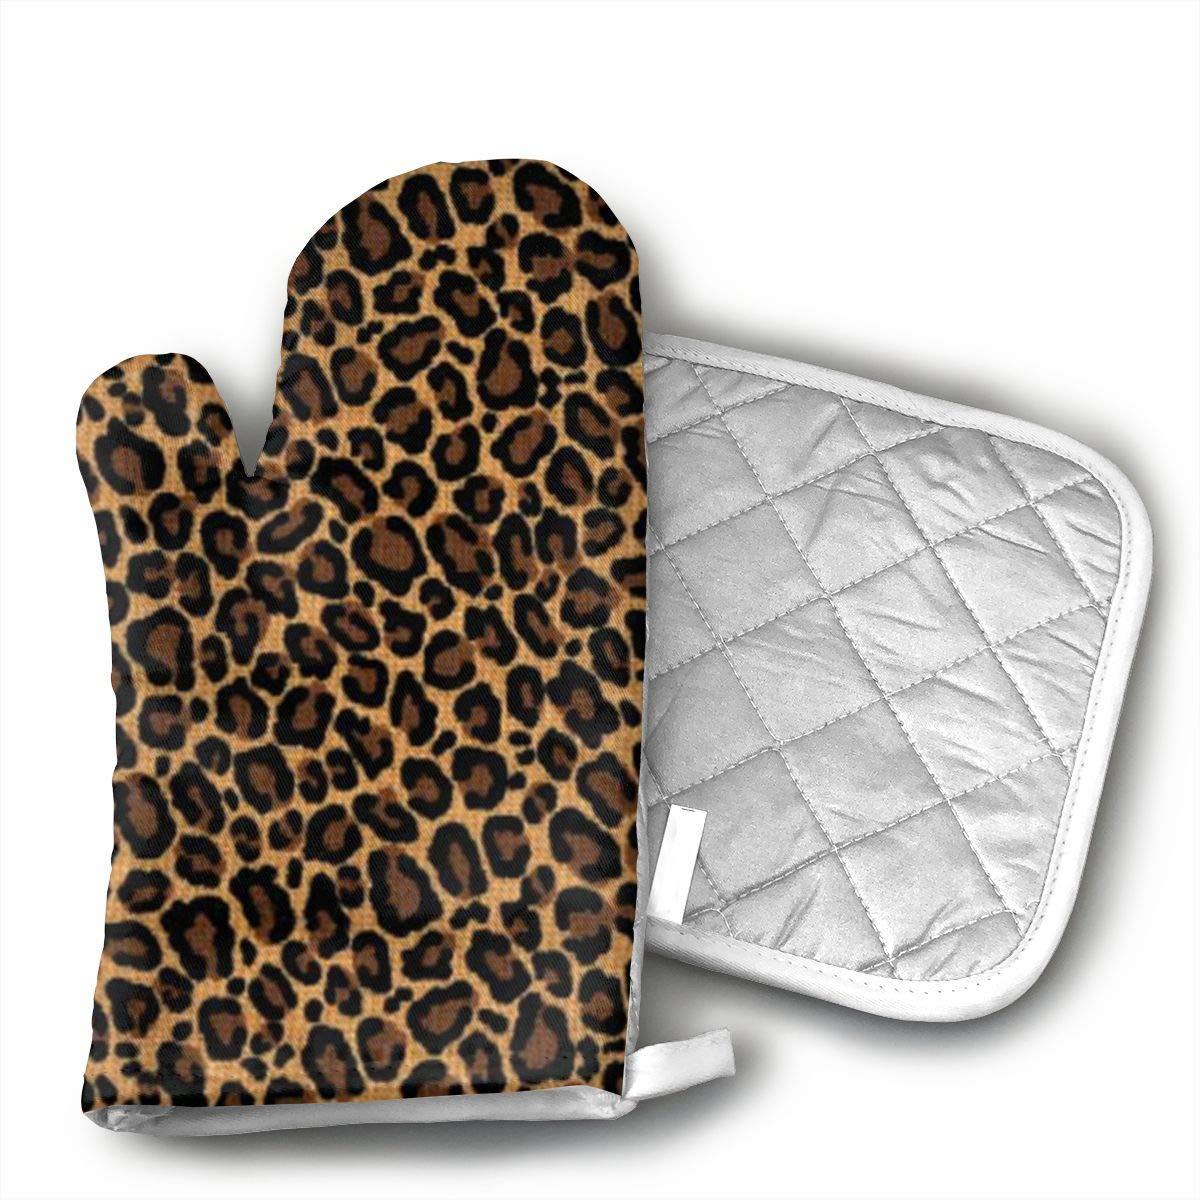 QEDGC Leopard Skin Cotton Oven Mitts Pot Holders Set - Kitchen Oven Mitt Heat Resistant, Non-Slip Grip Oven Gloves PotholderCooking,Baking & BBQ,